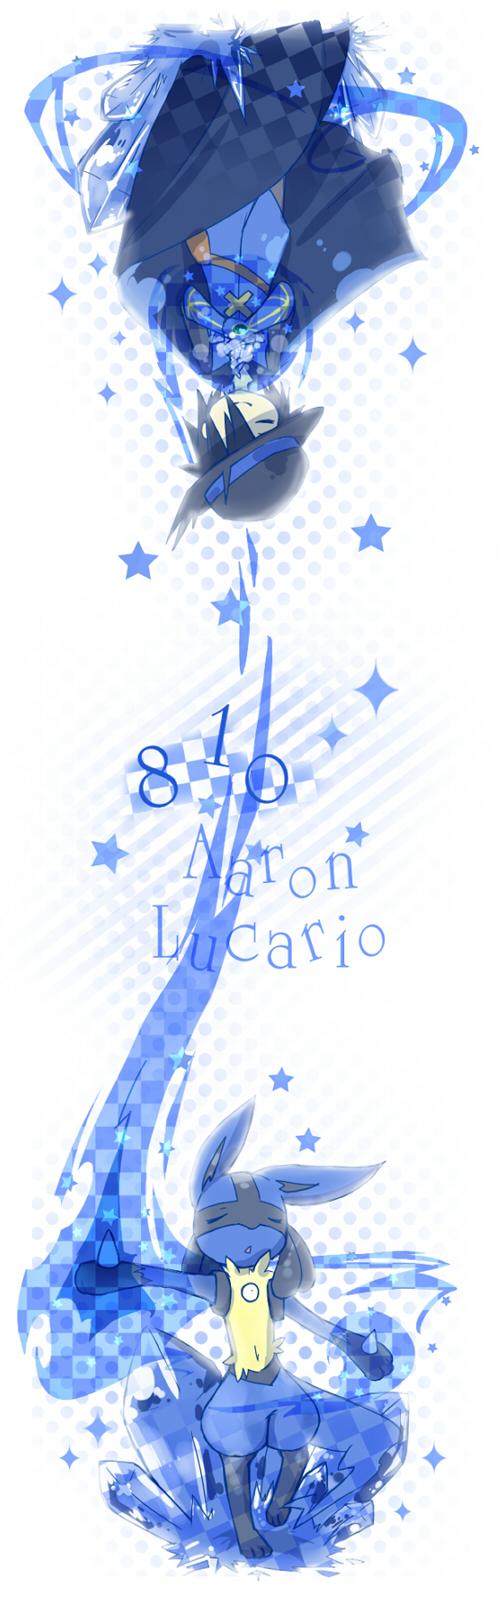 Tags: Anime, Pixiv Id 171131, Pokémon (Anime), Pokémon the Movie: Lucario and the Mystery of Mew, Pokémon, Arlon (Pokémon), Lucario, Gen (Pokémon), Fanart From Pixiv, Fanart, Pixiv